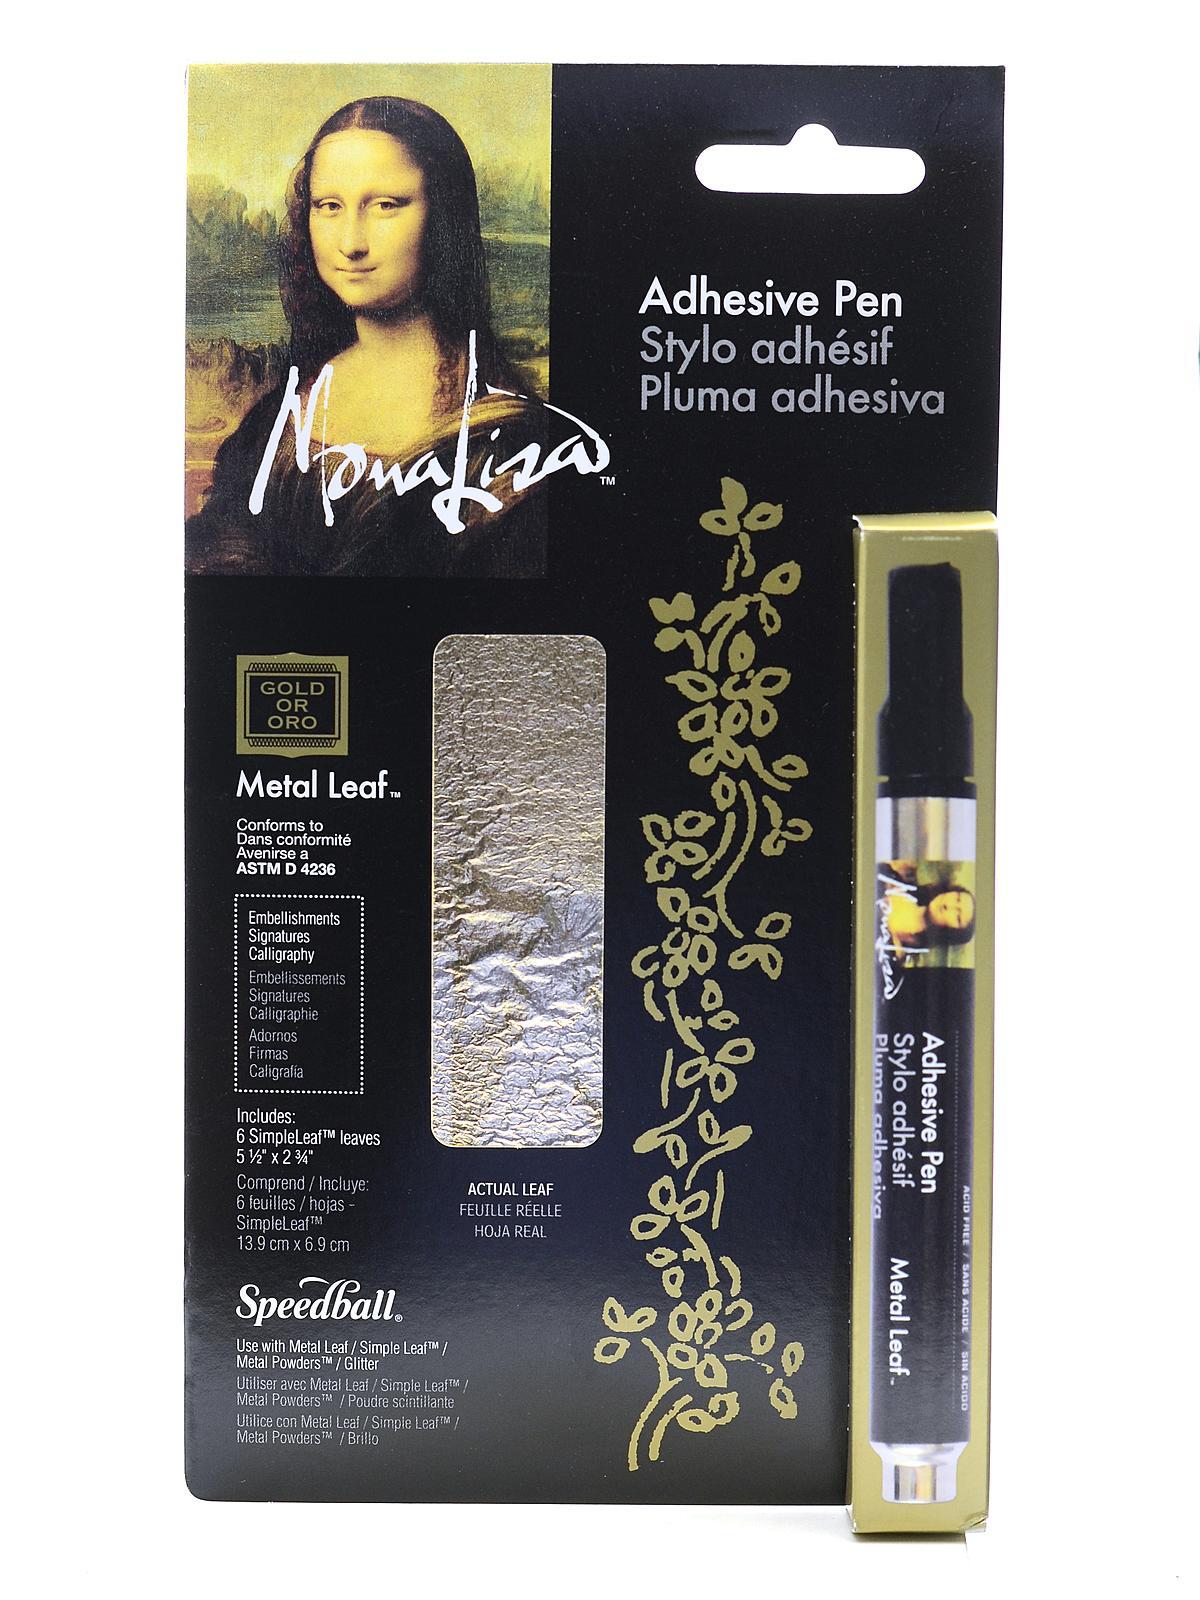 Adhesive Pen